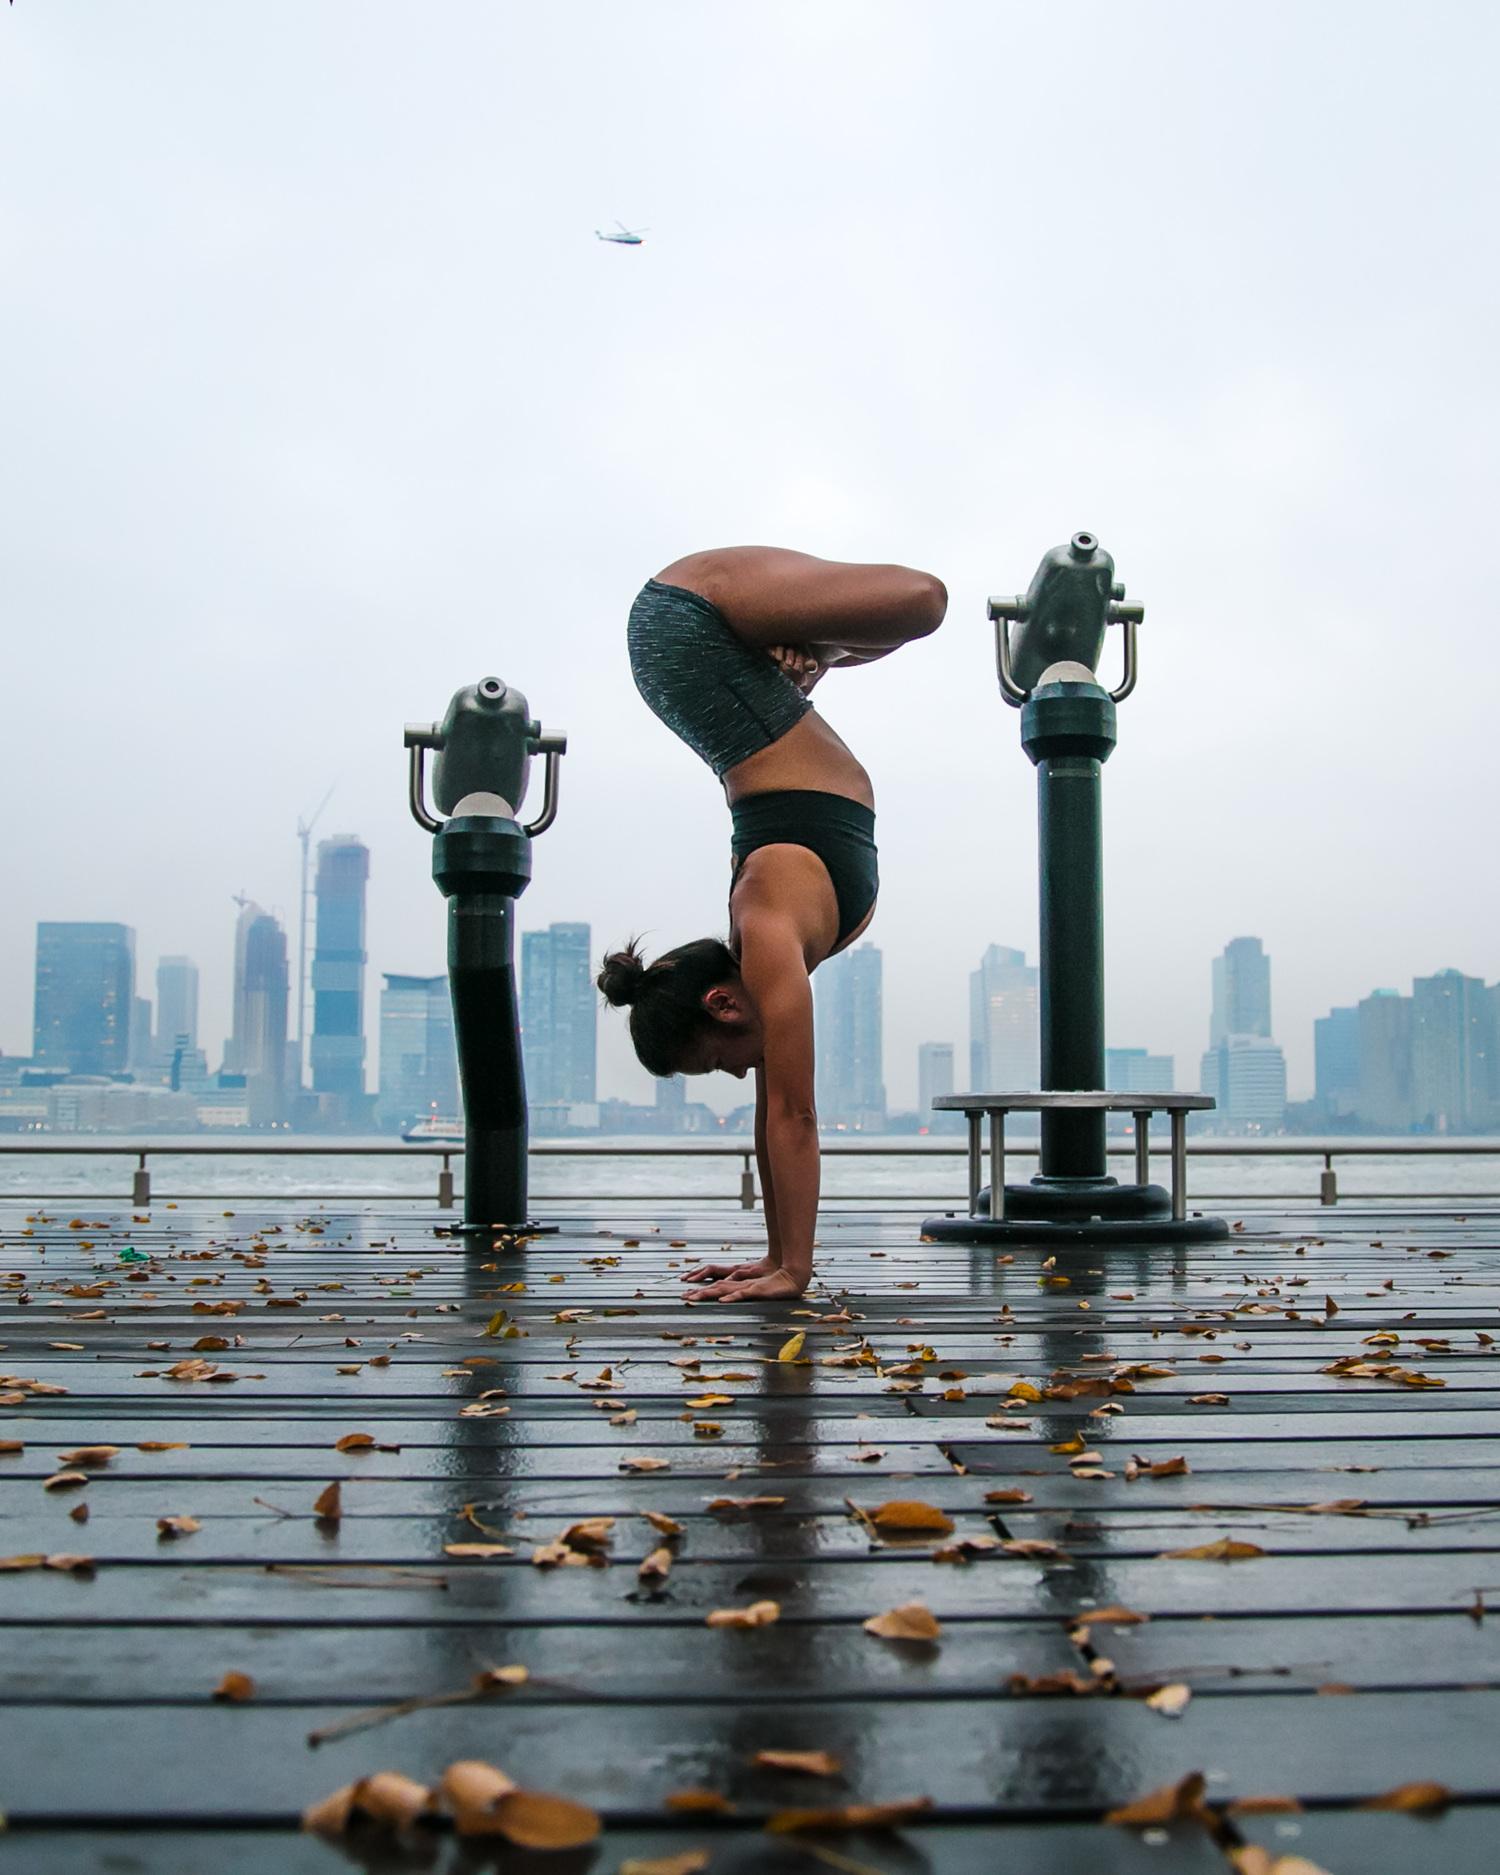 Публично: стриптиз и йога на улицах большого города